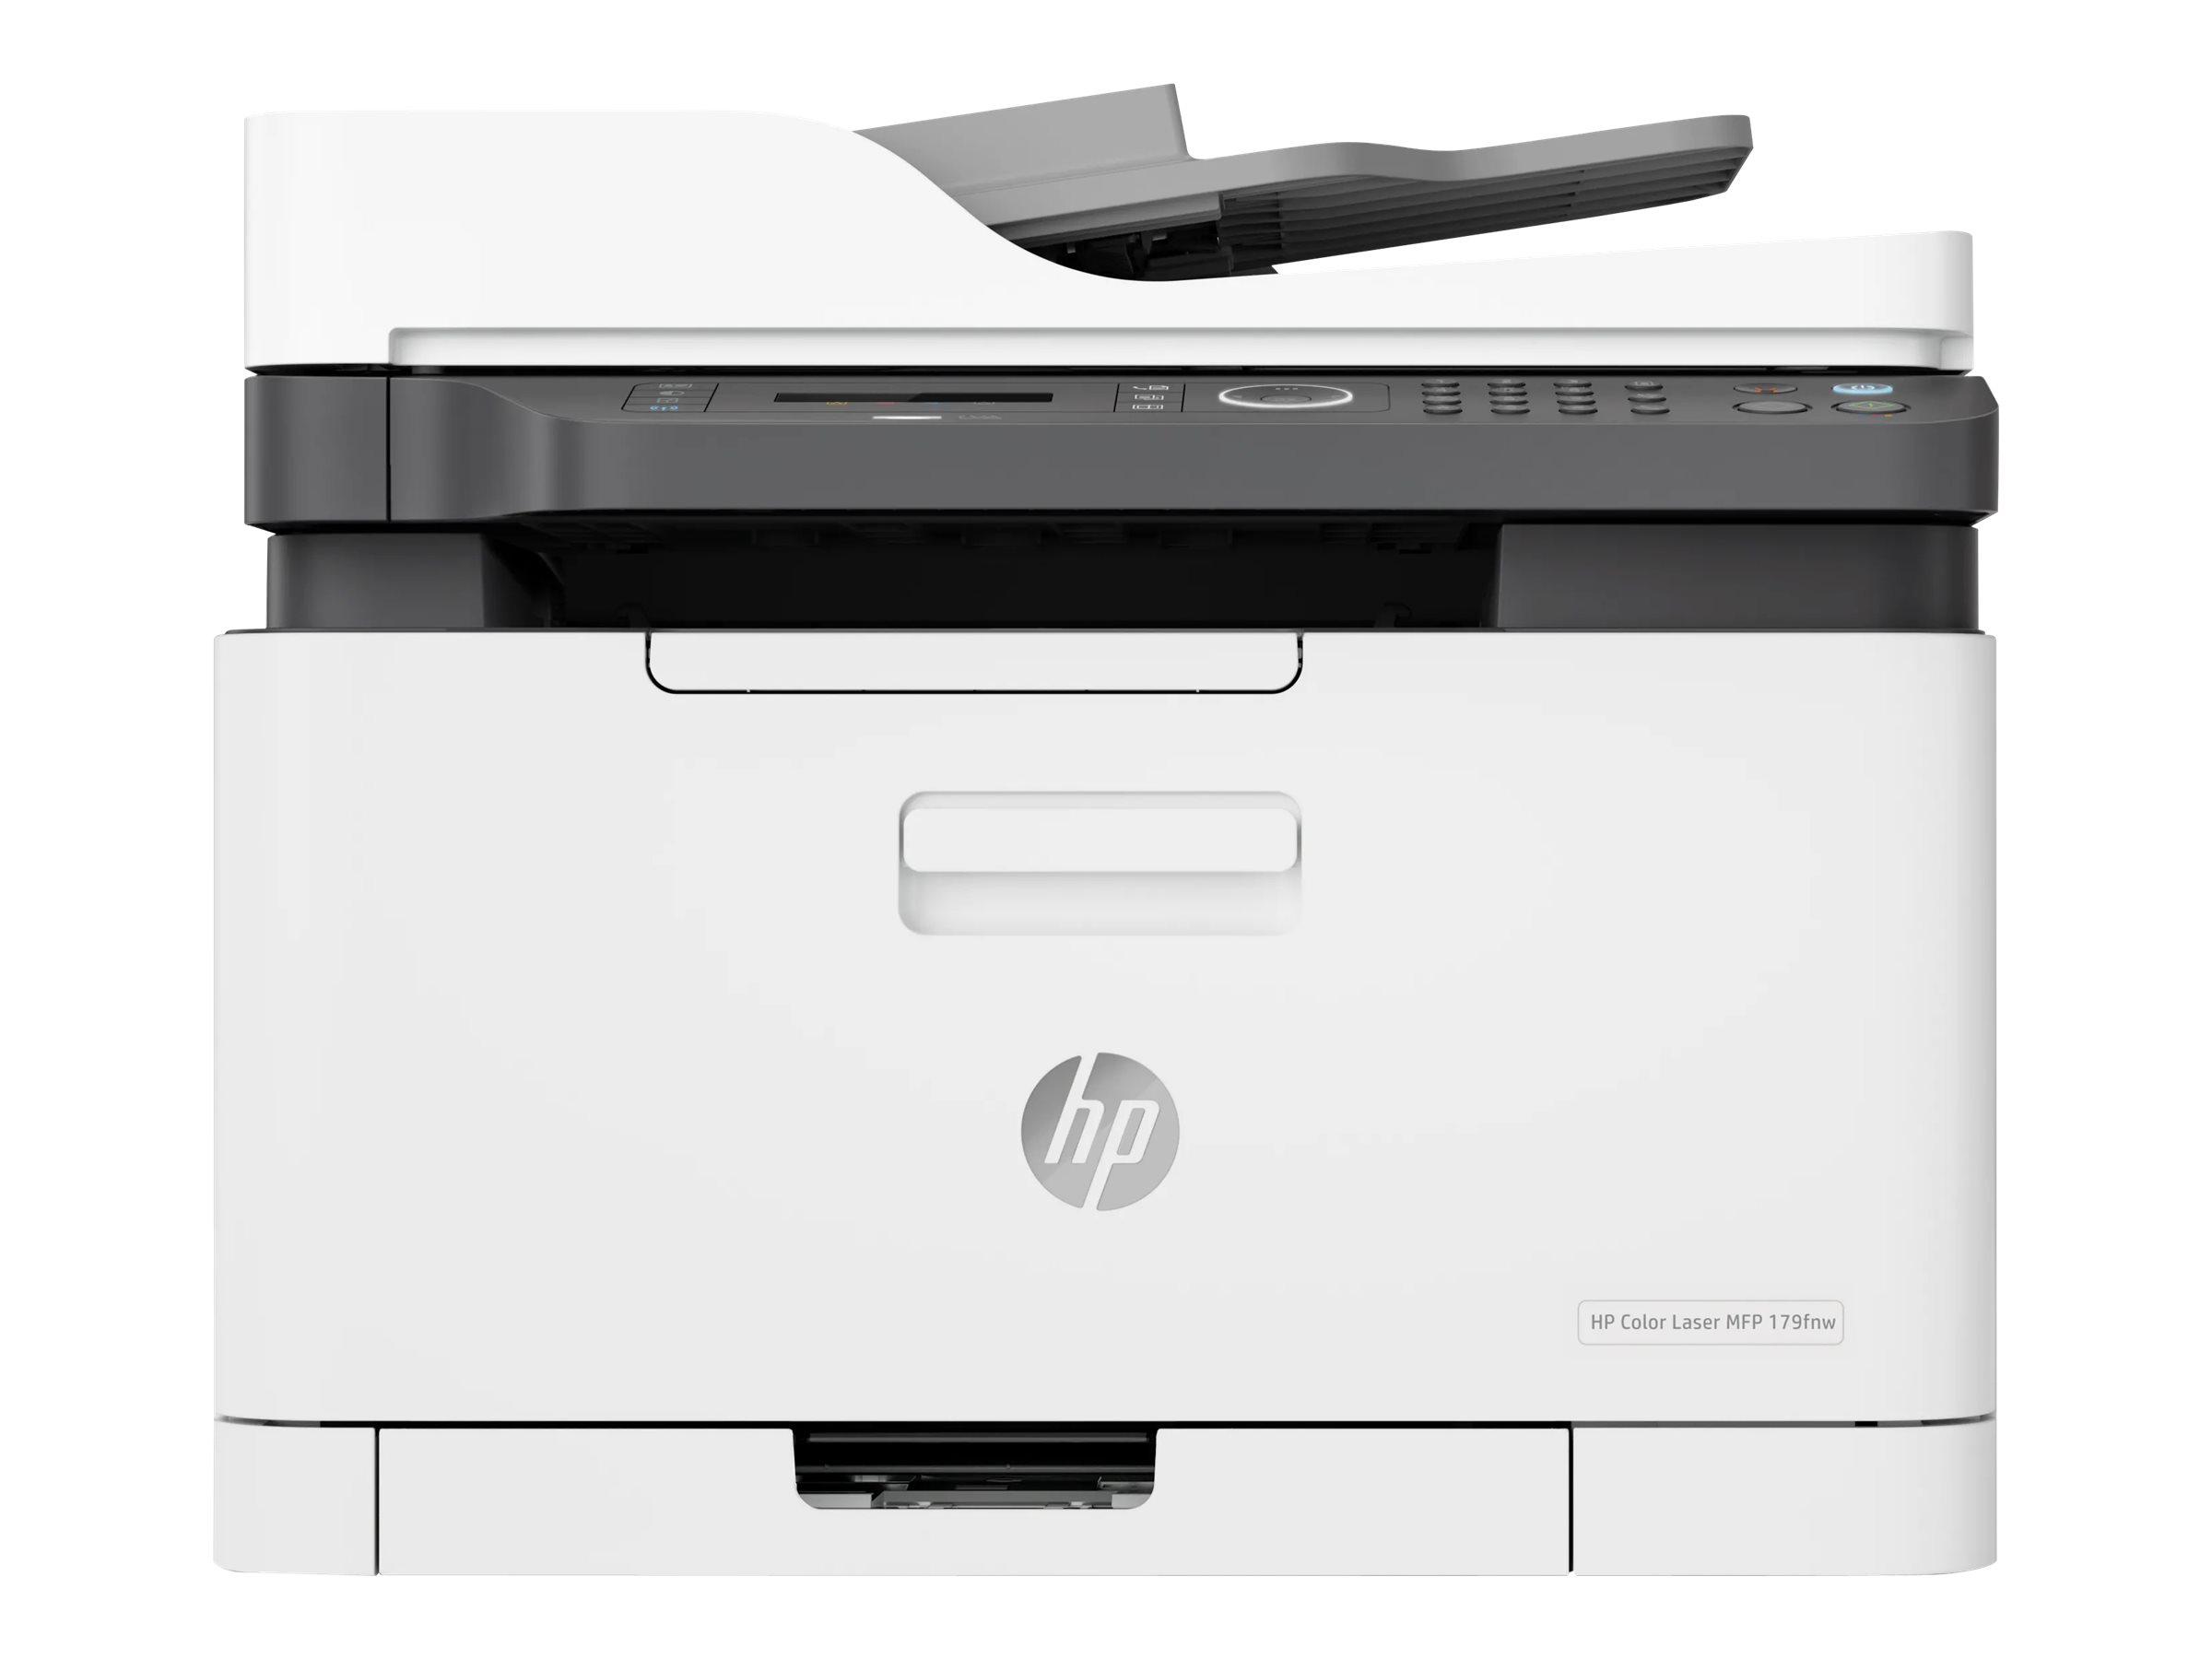 Hp color laser mfp 179fnw multifunktionsdrucker farbe laser a4 210 x 297 mm original a4 letter medien 11446587 6hu09a b19